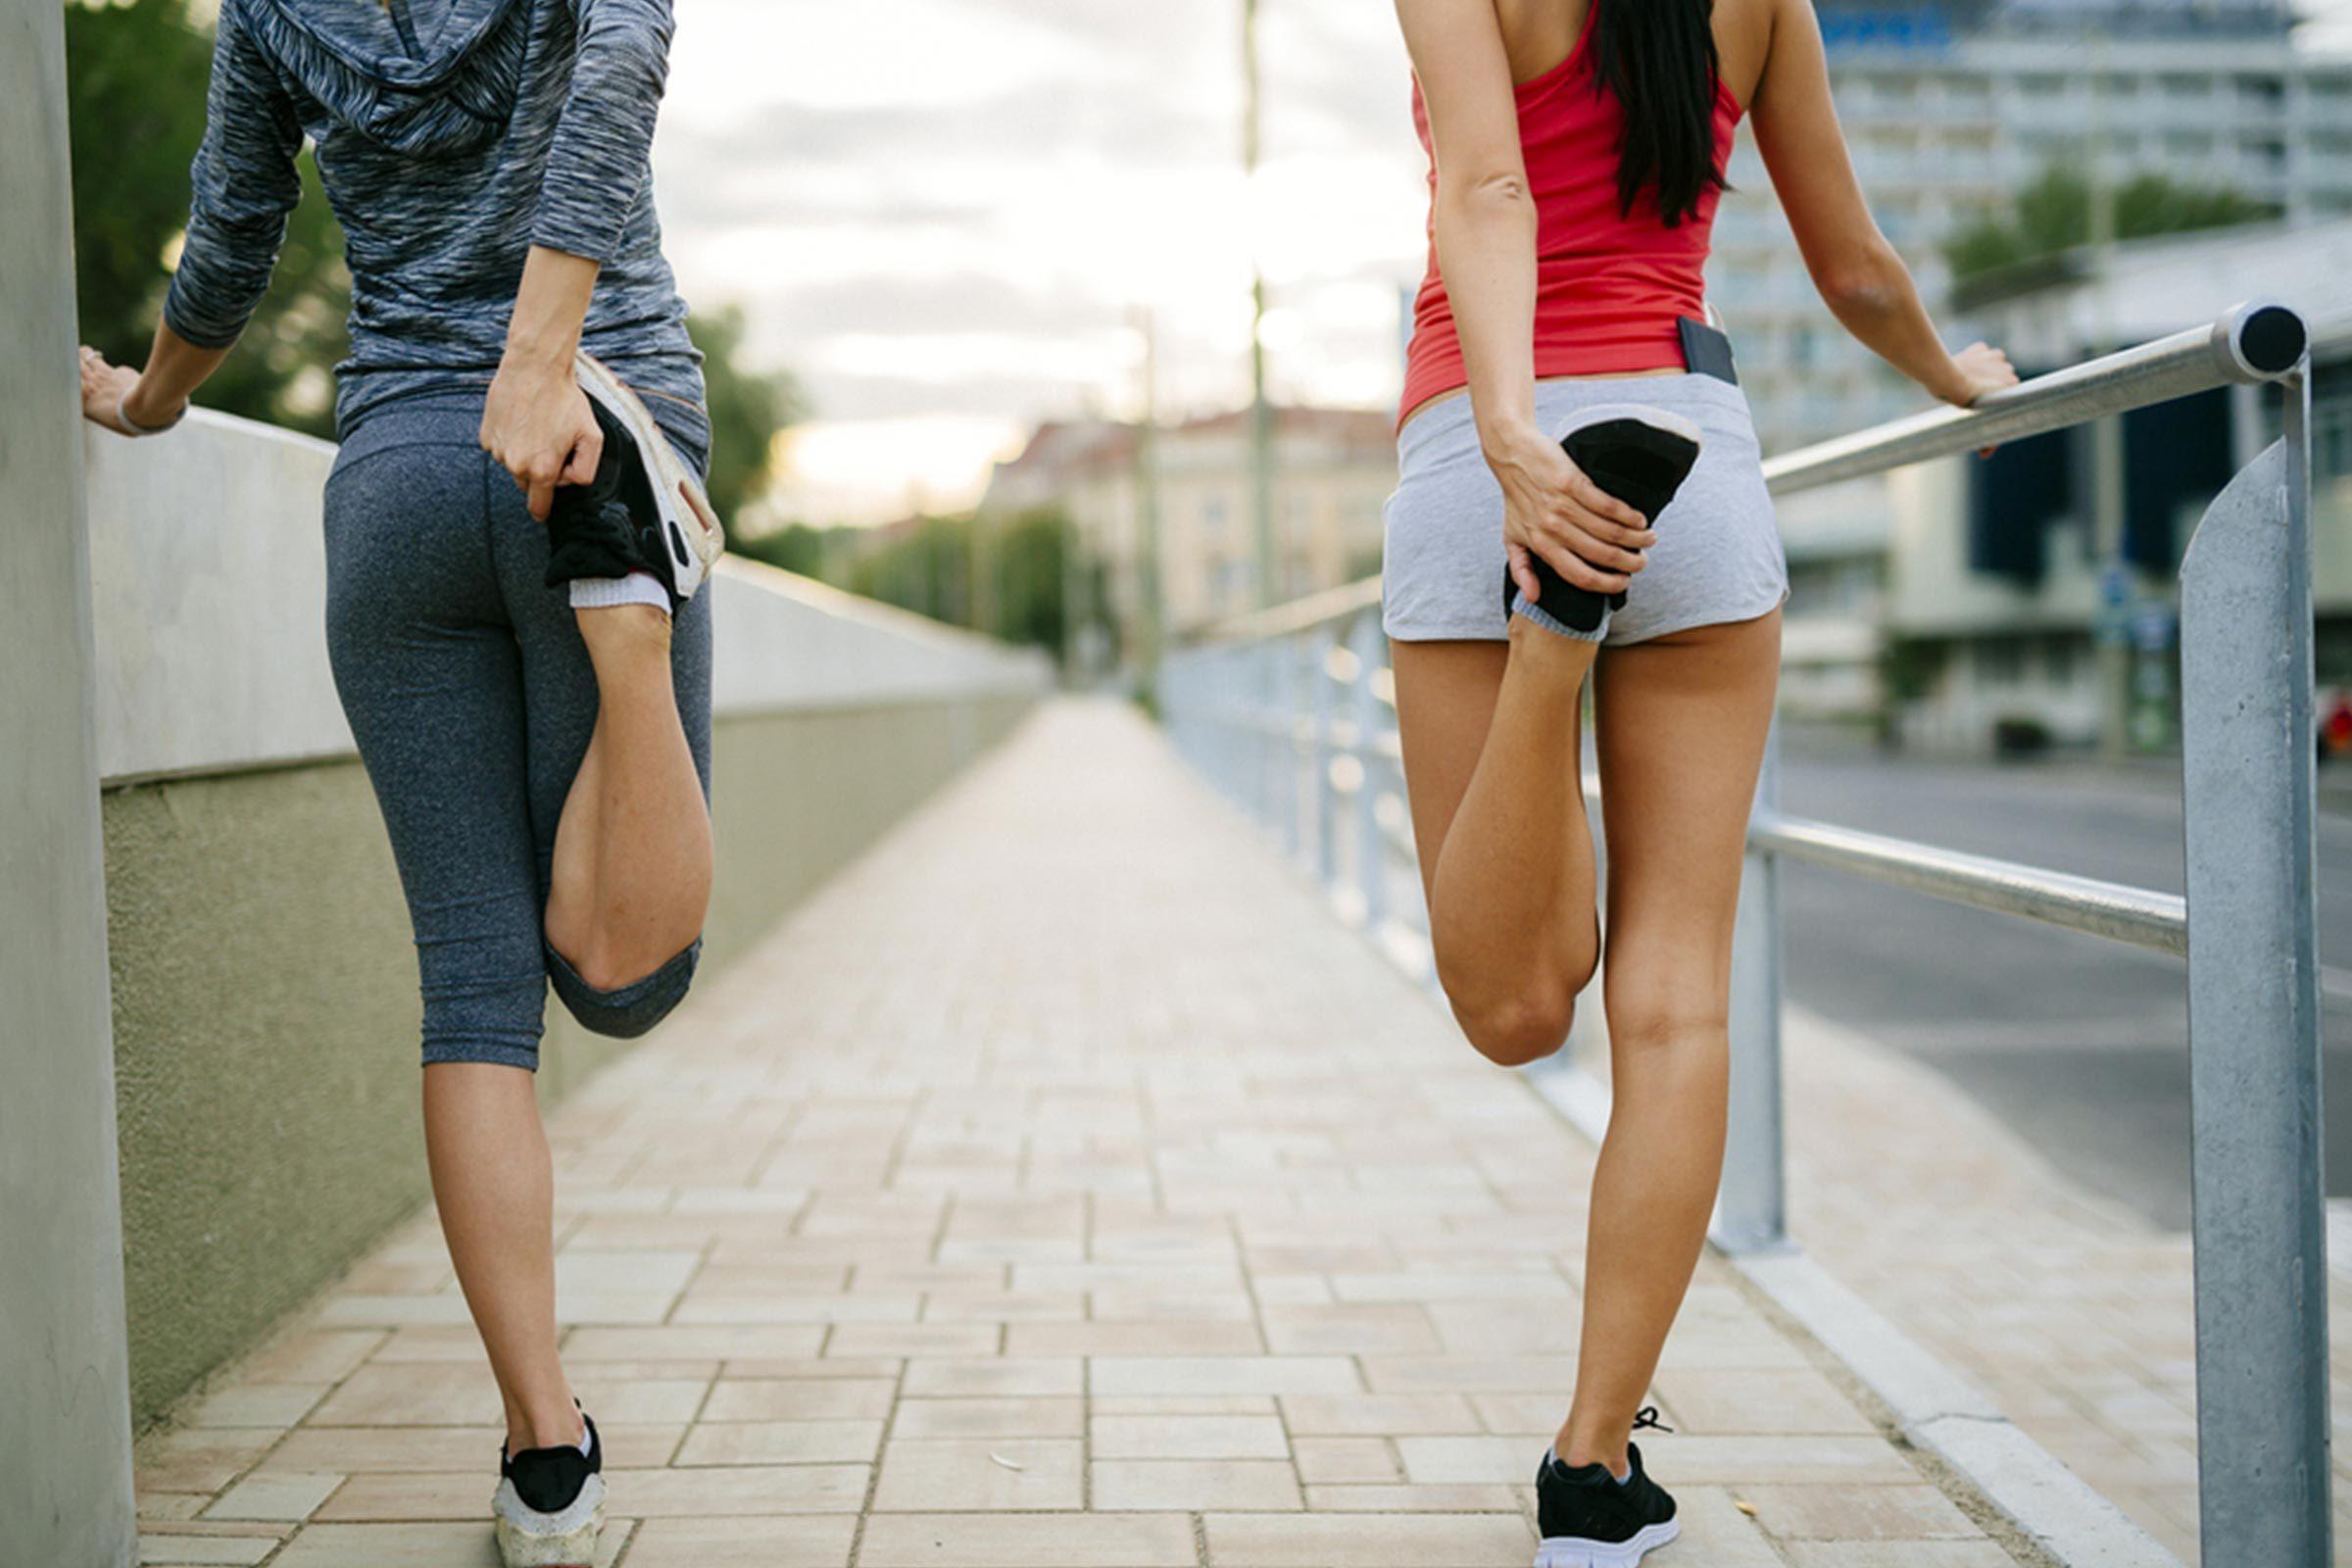 two women stretching before running